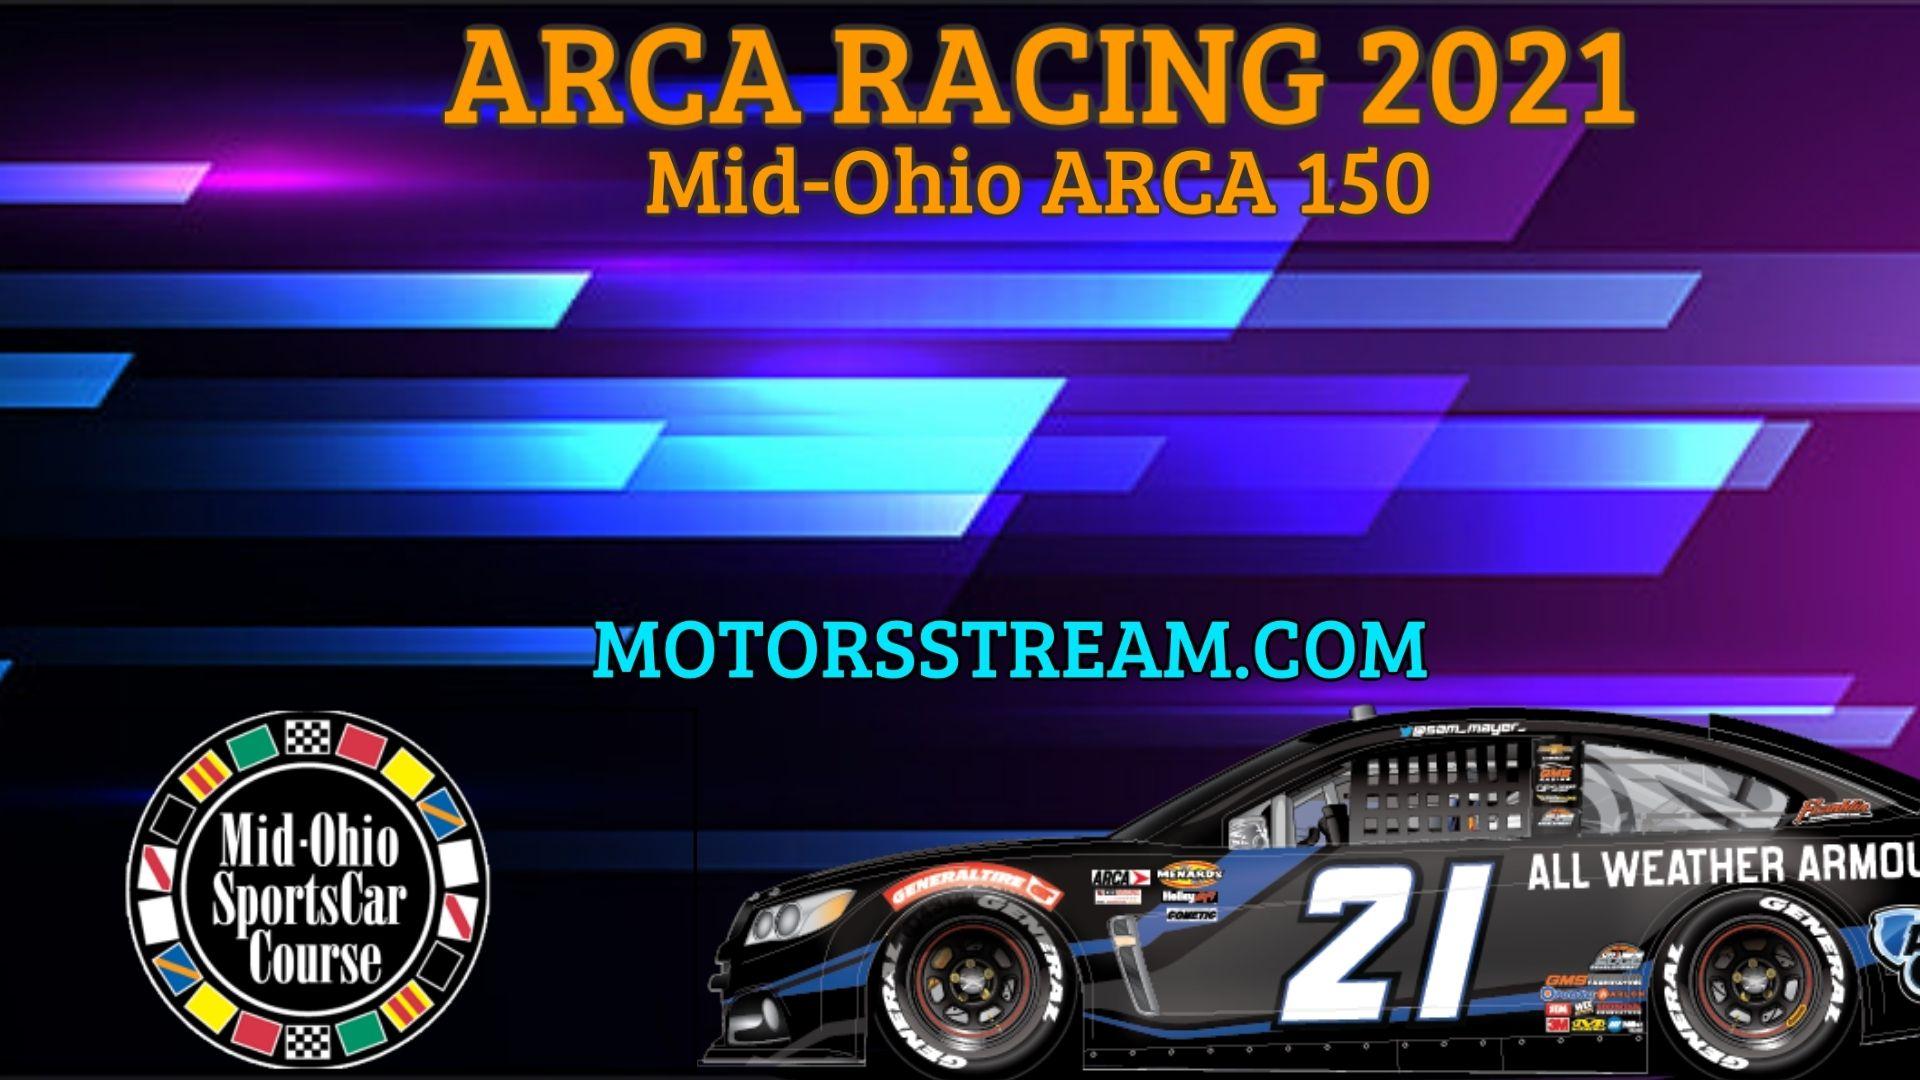 Mid Ohio ARCA 150 Live Stream 2021 Arca Racing